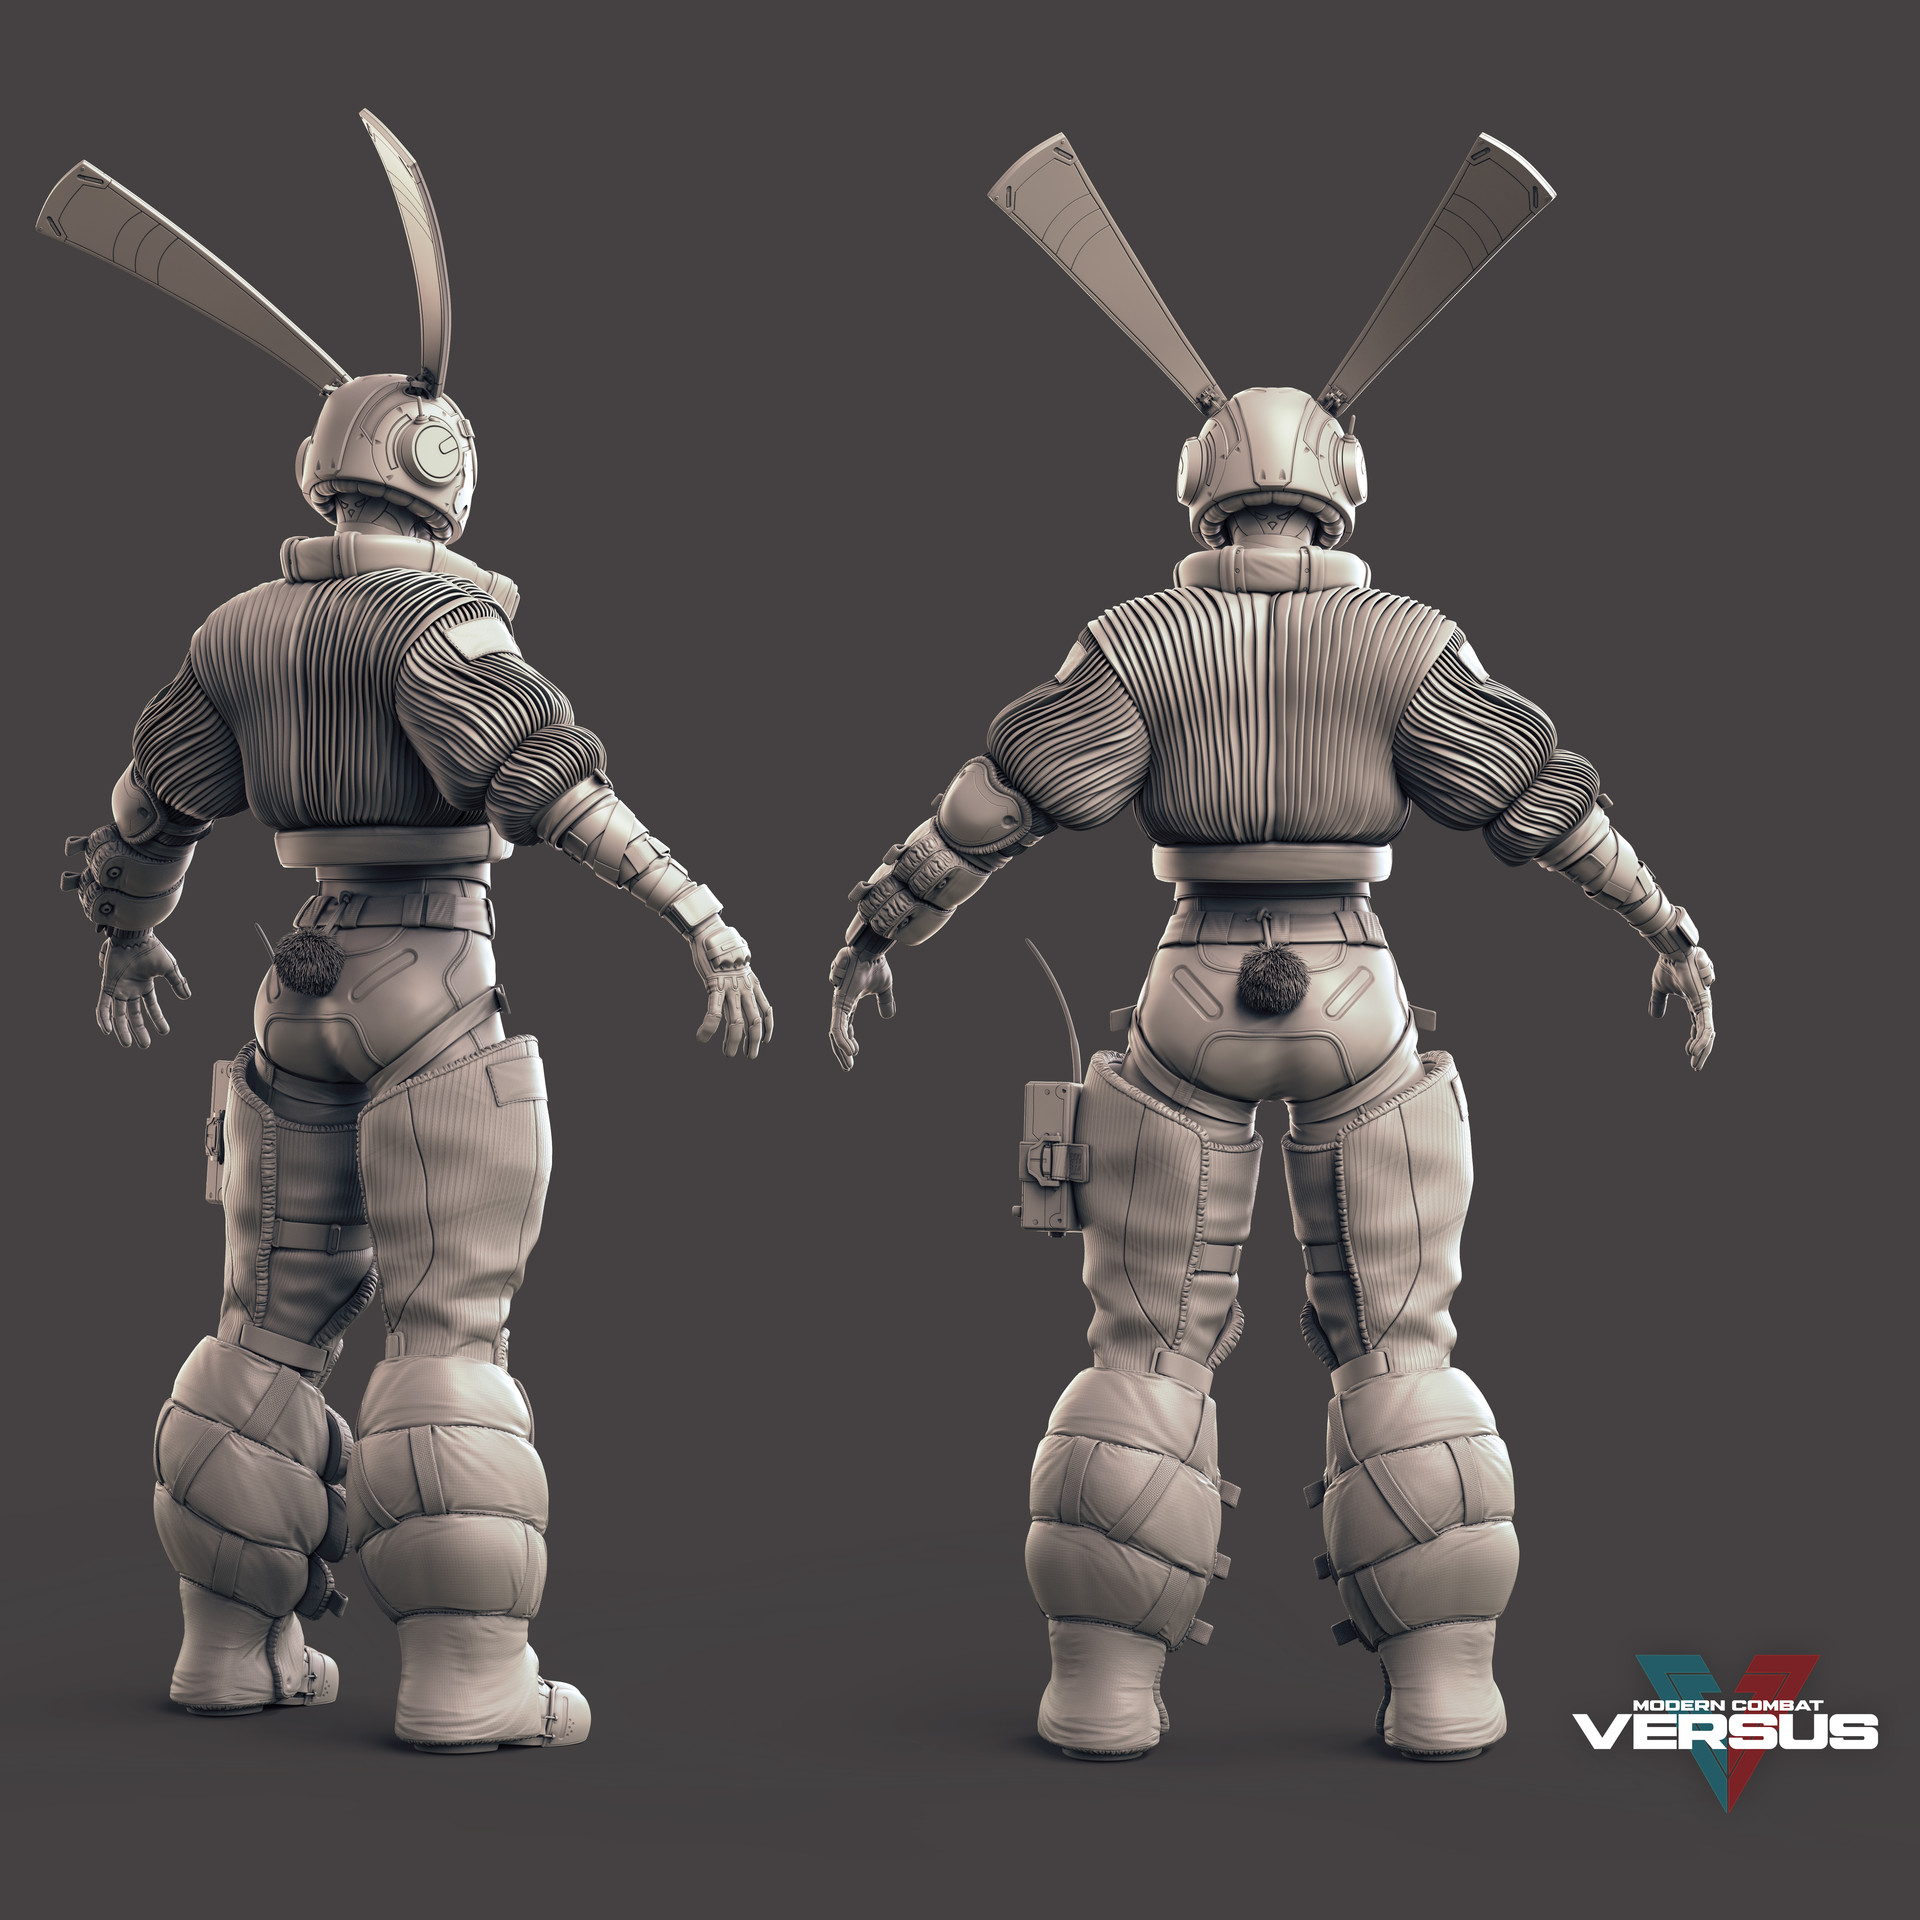 Alexandre proulx audy ks swift bunny 3